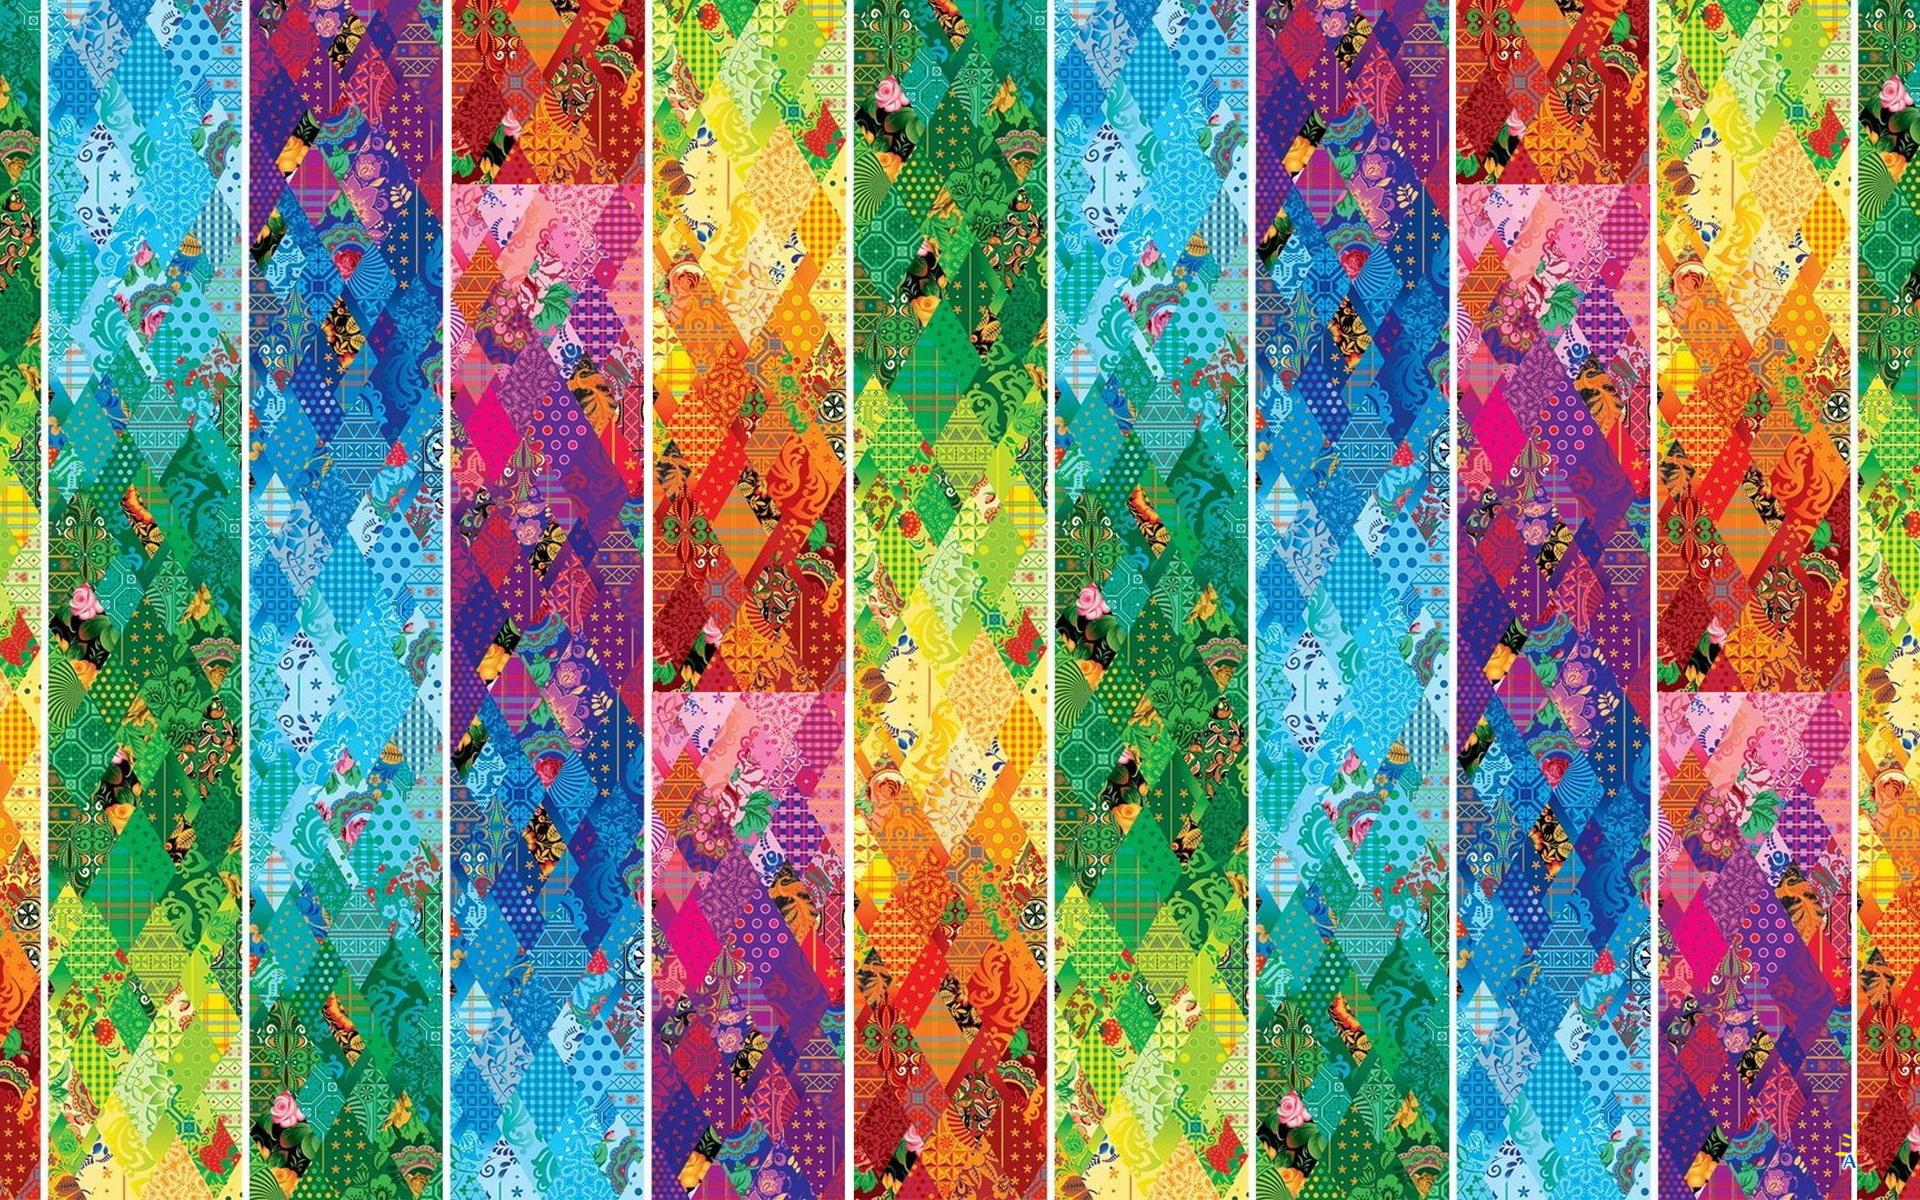 Wallpaper olympics patchwork quilt sochi 2014 desktop wallpaper 1920x1200